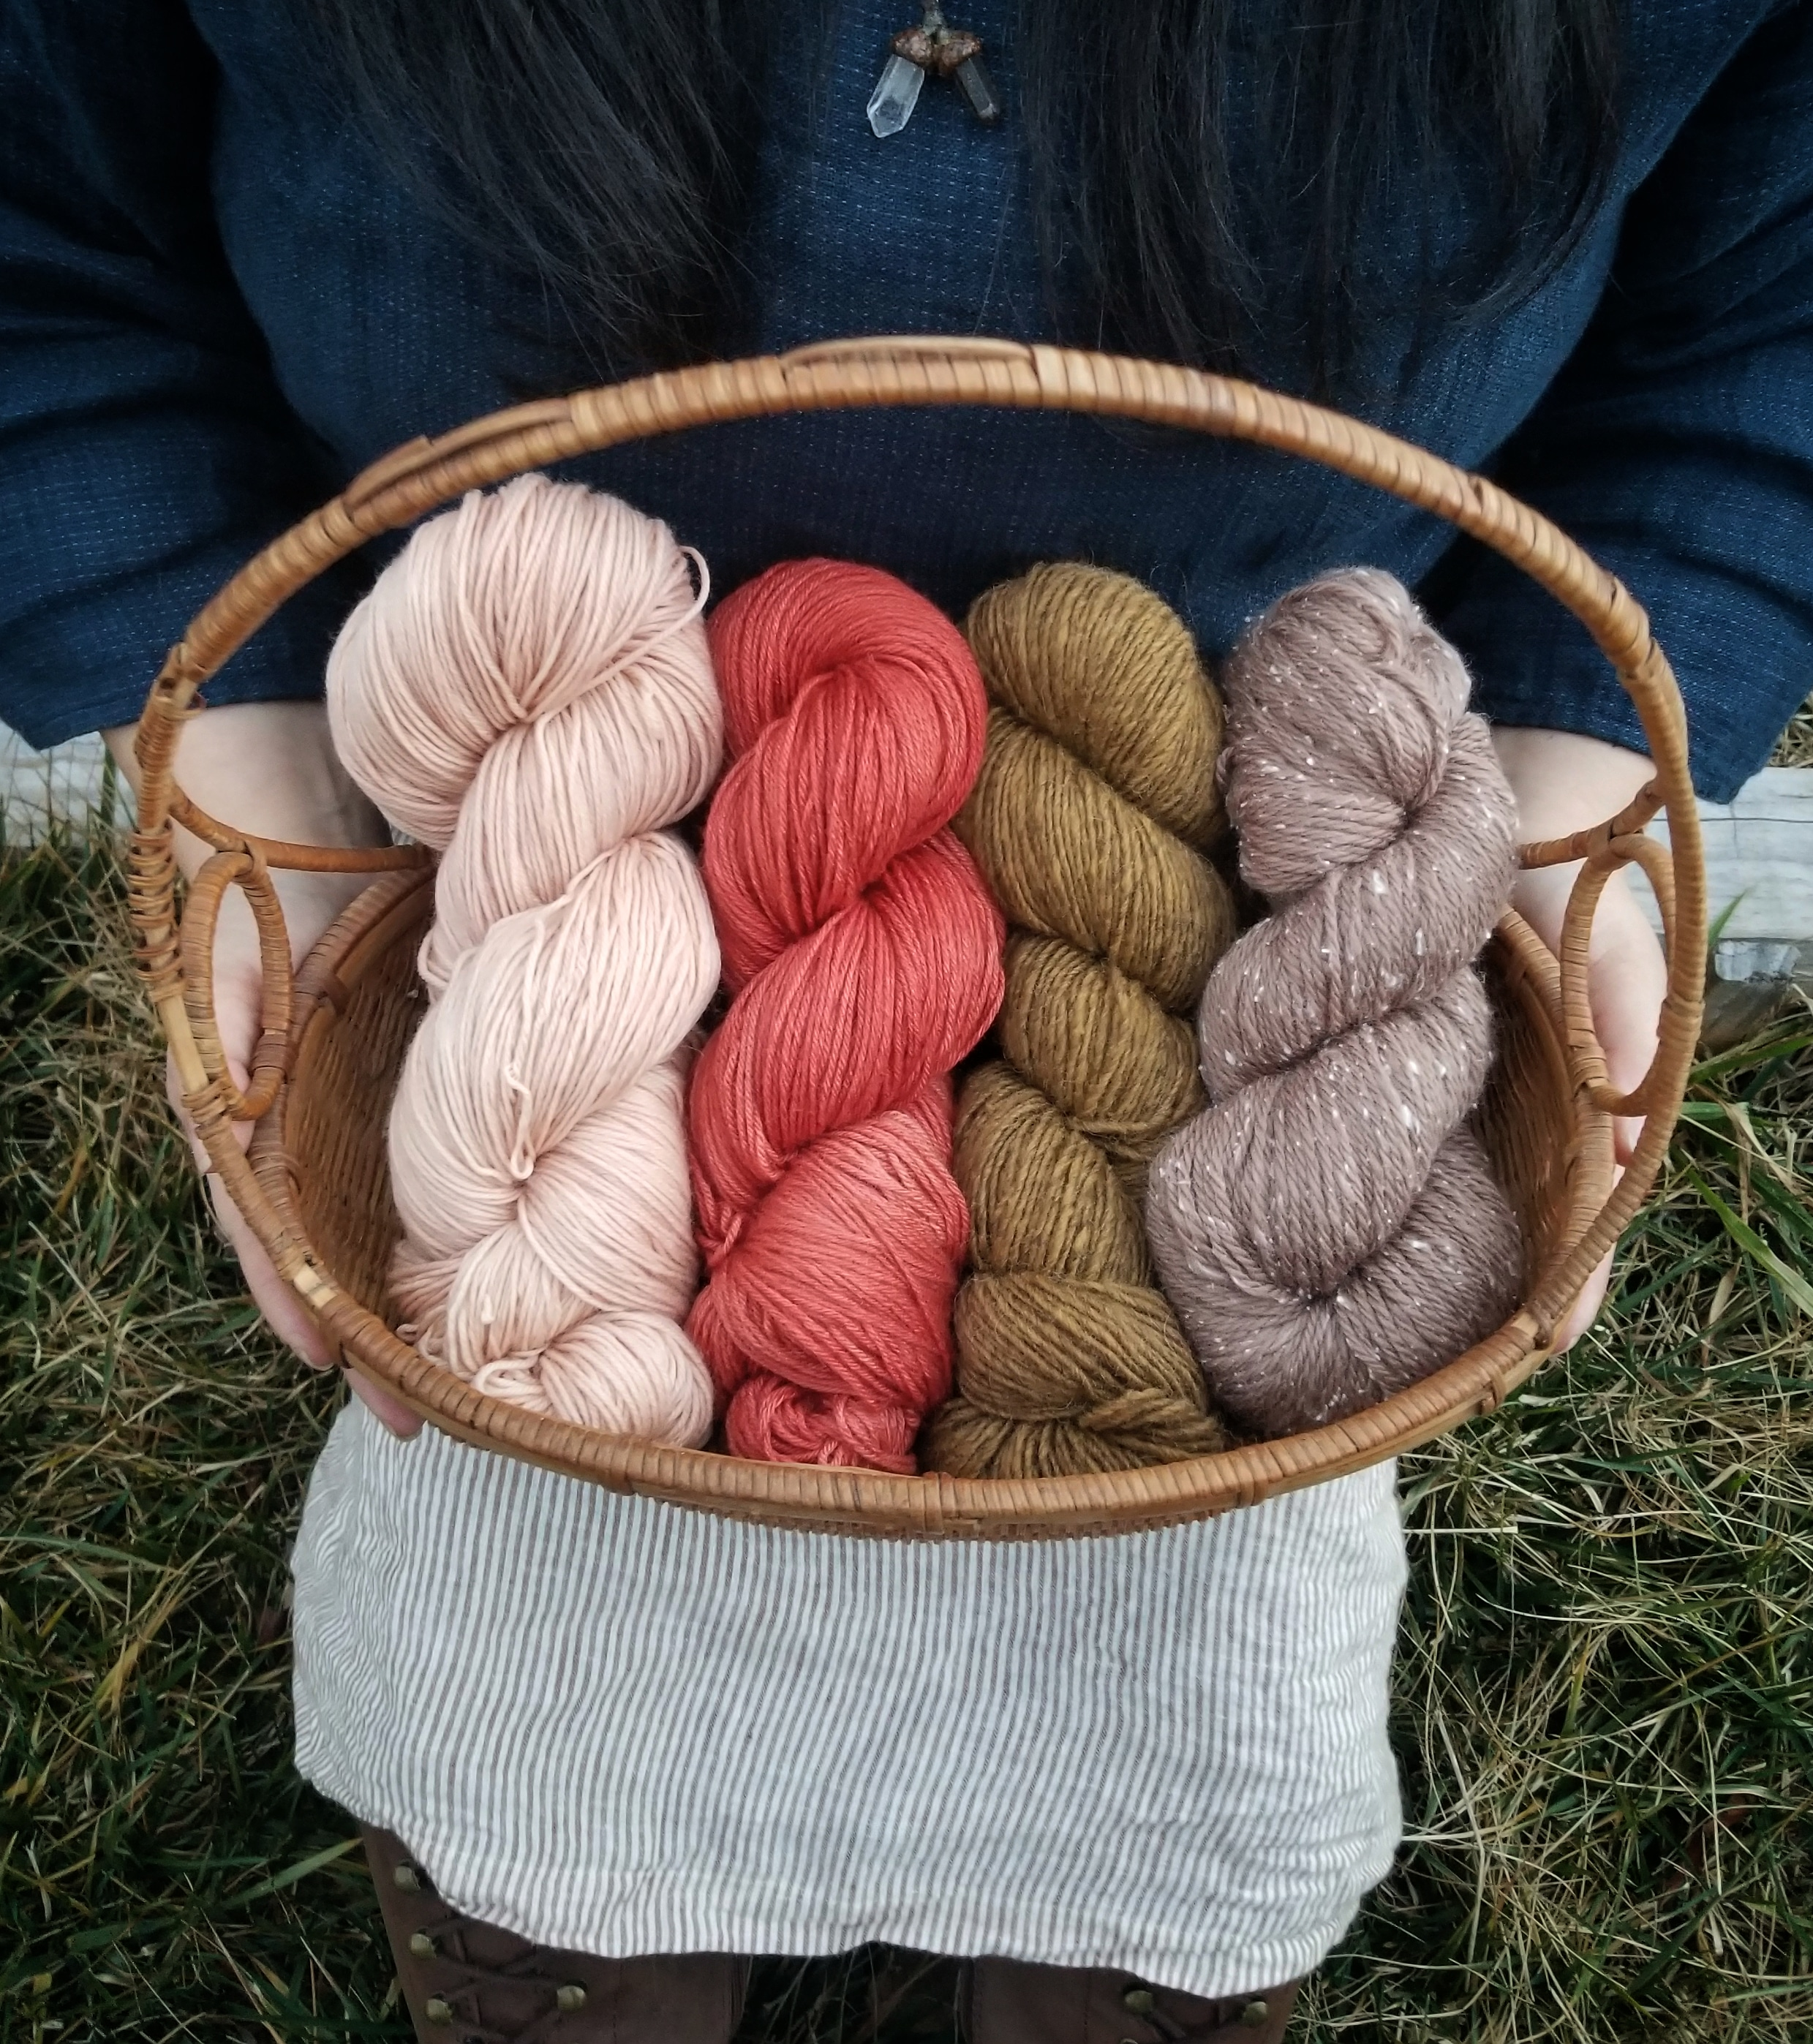 Maria's beautiful fiber collection!